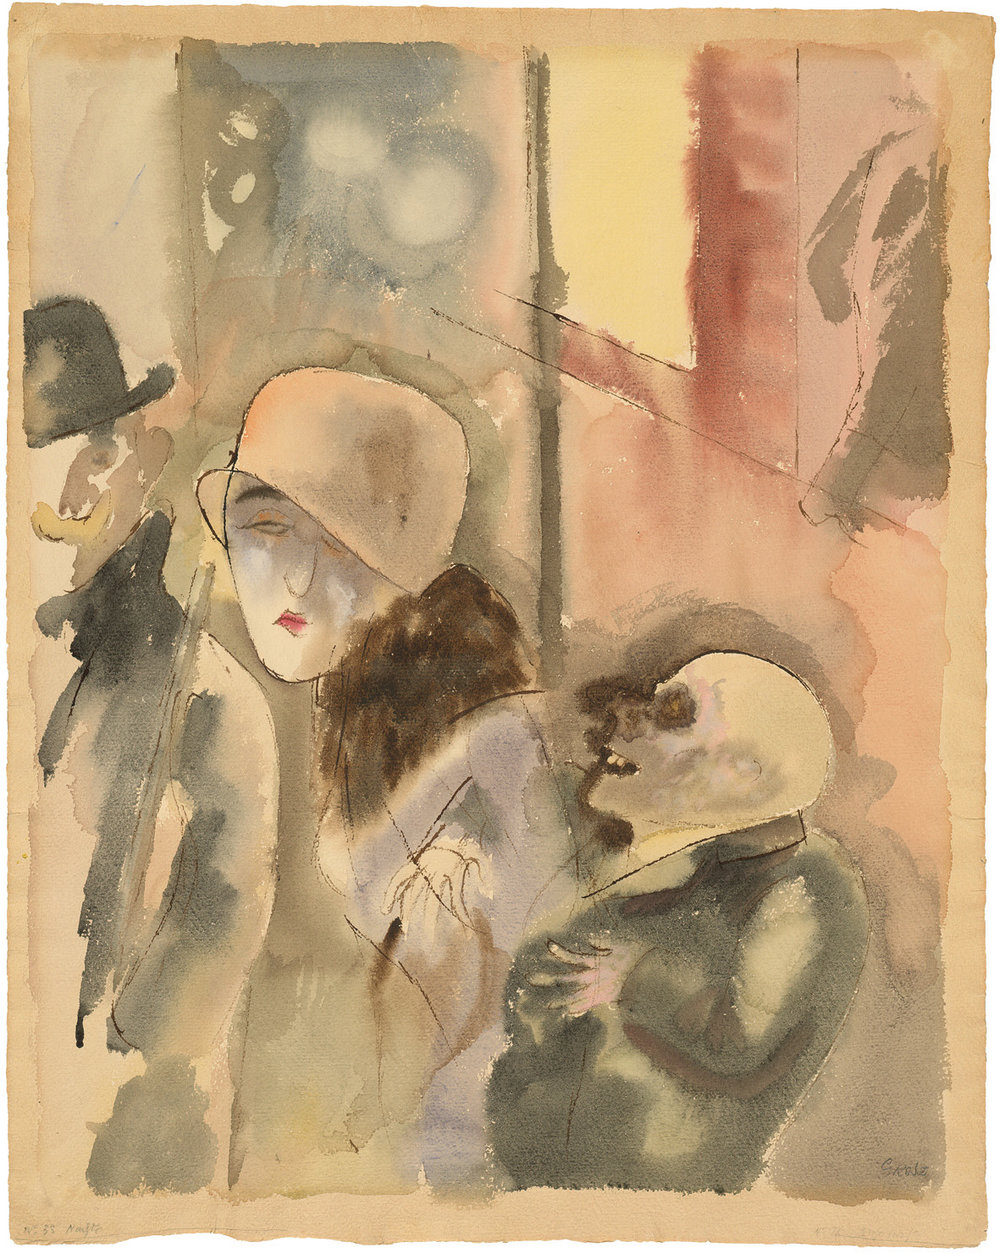 George Grosz  NACHTS Watercolor, 1916.  George Grosz: © Estate of George Grosz, Princeton, N.J. / VG Bild-Kunst, Bonn 2019.